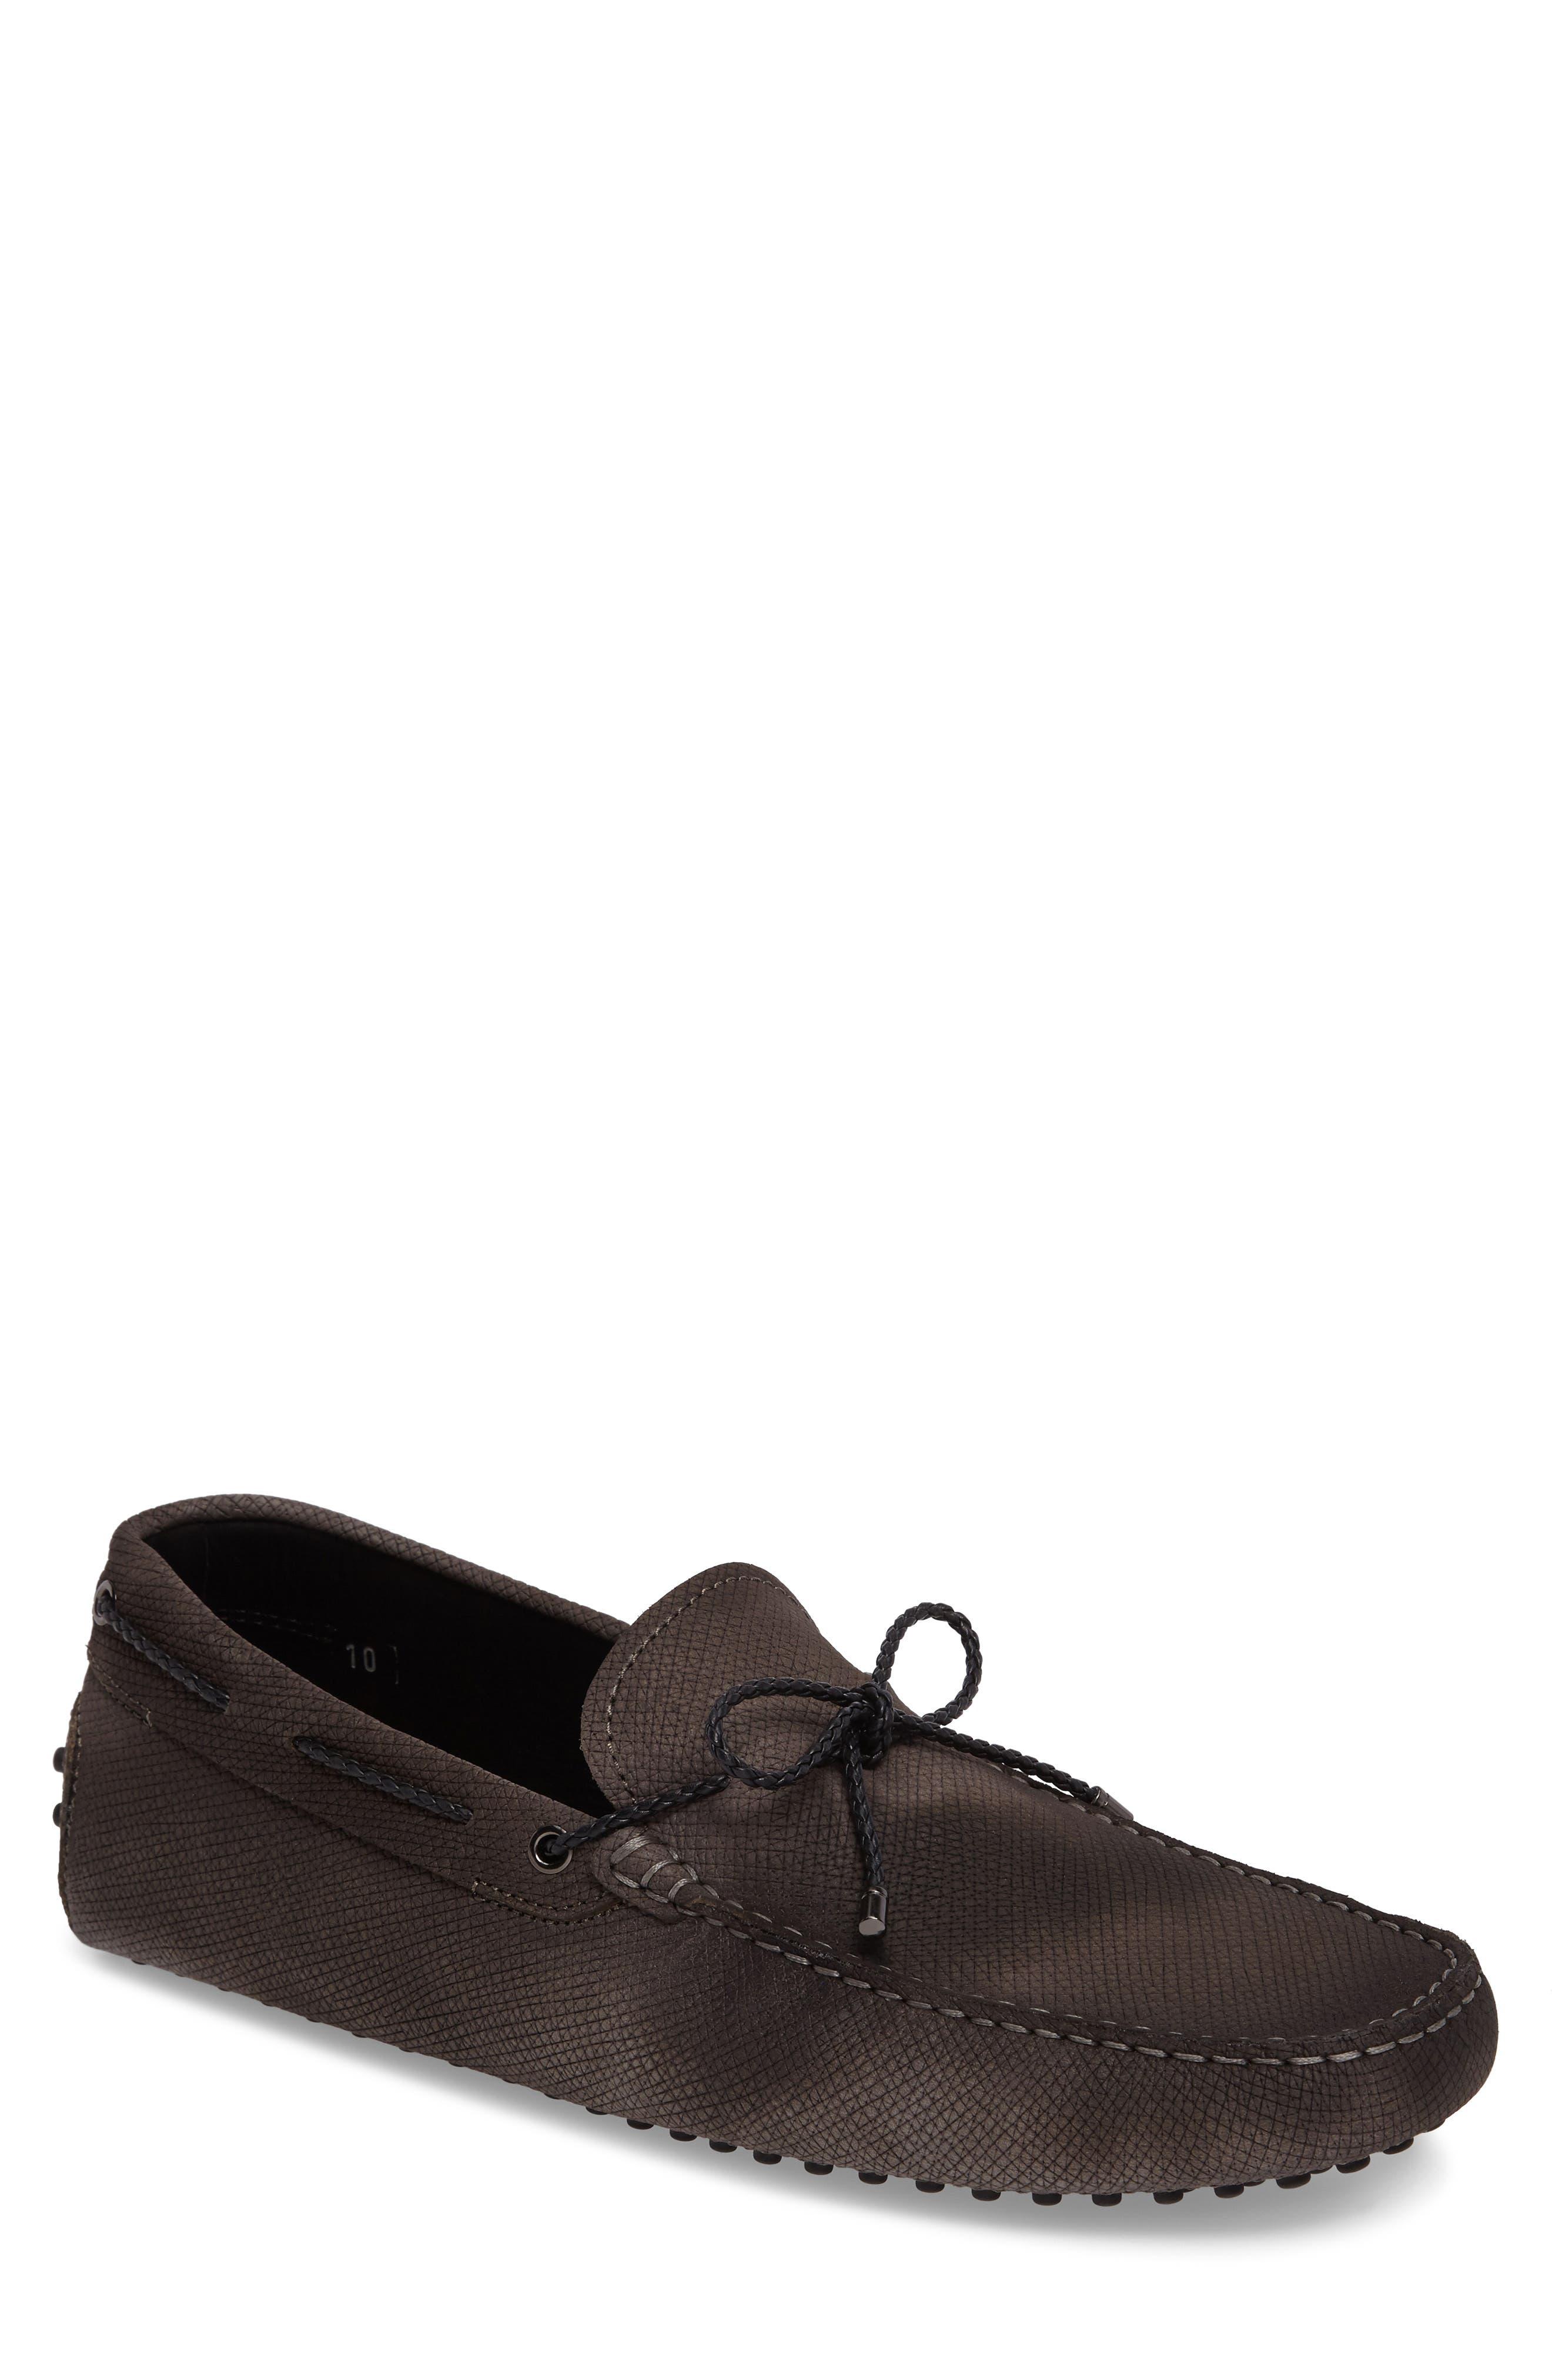 Alternate Image 1 Selected - Tod's Gommin Textured Driving Shoe (Men)